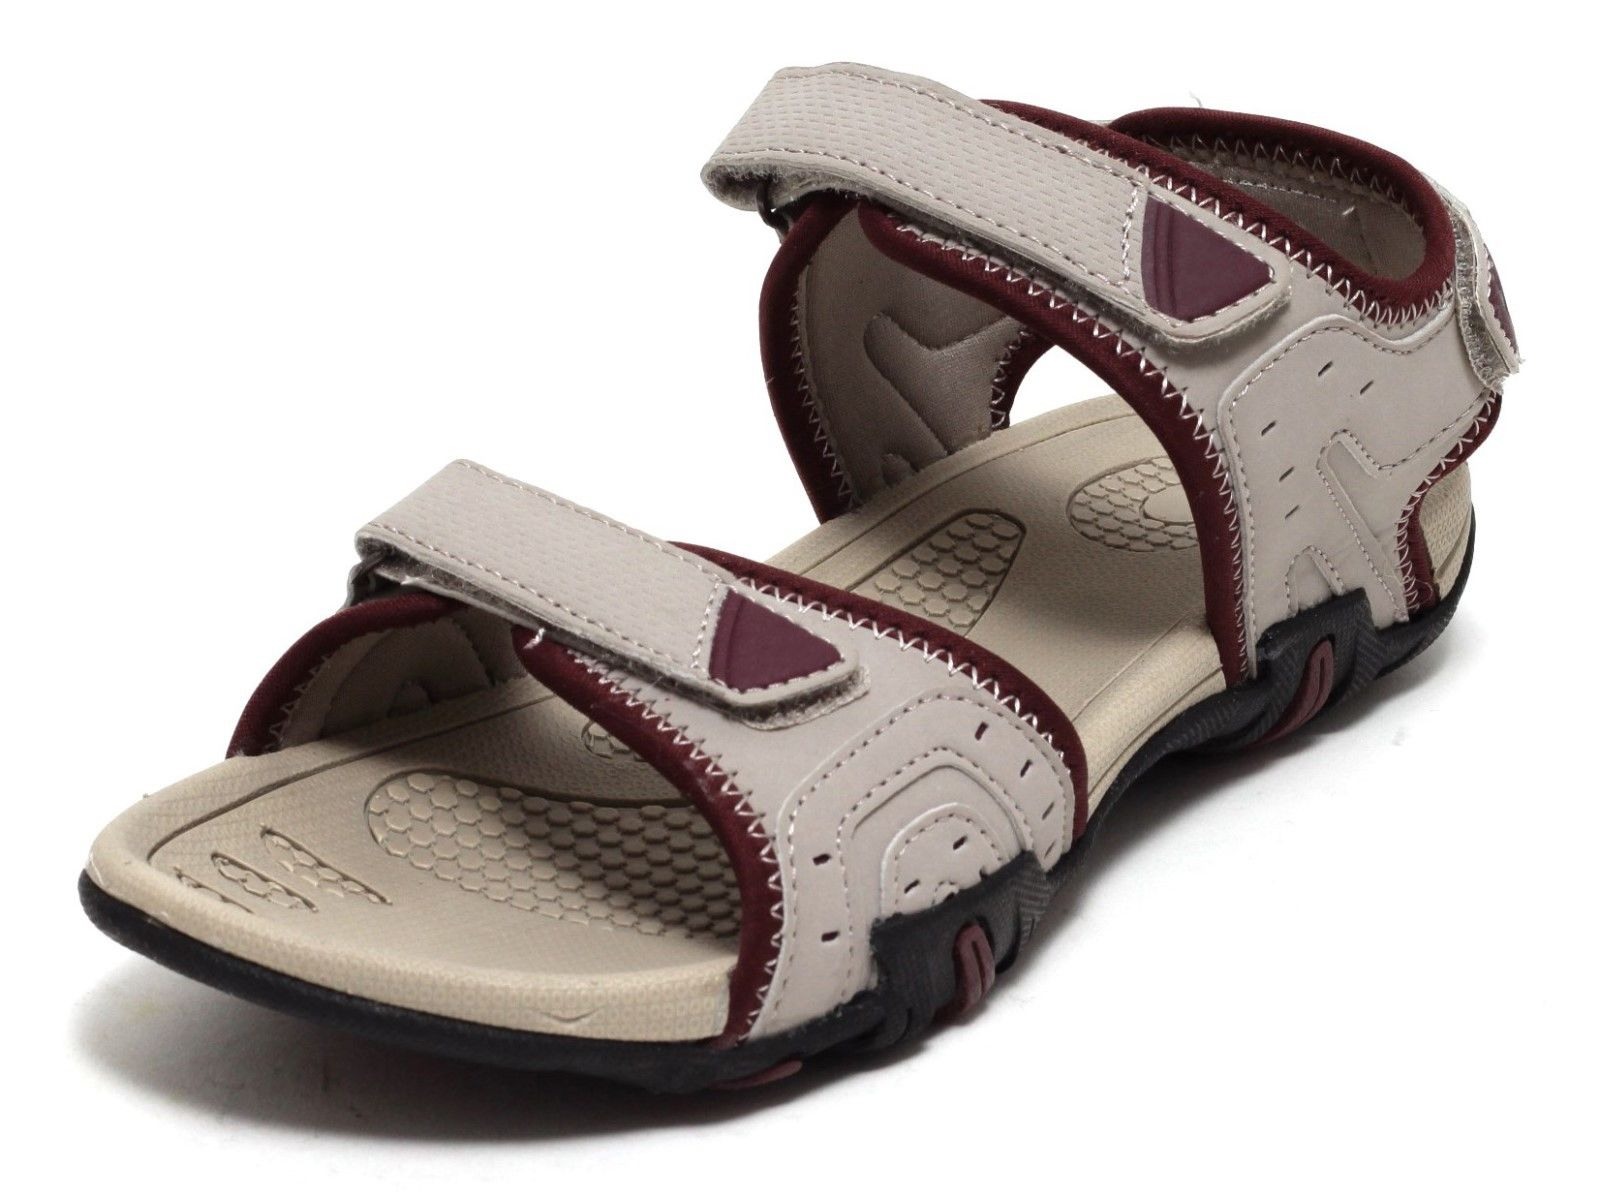 damen trekkingsandalen outdoor sandalette trekking wander sandalen beige beere ebay. Black Bedroom Furniture Sets. Home Design Ideas